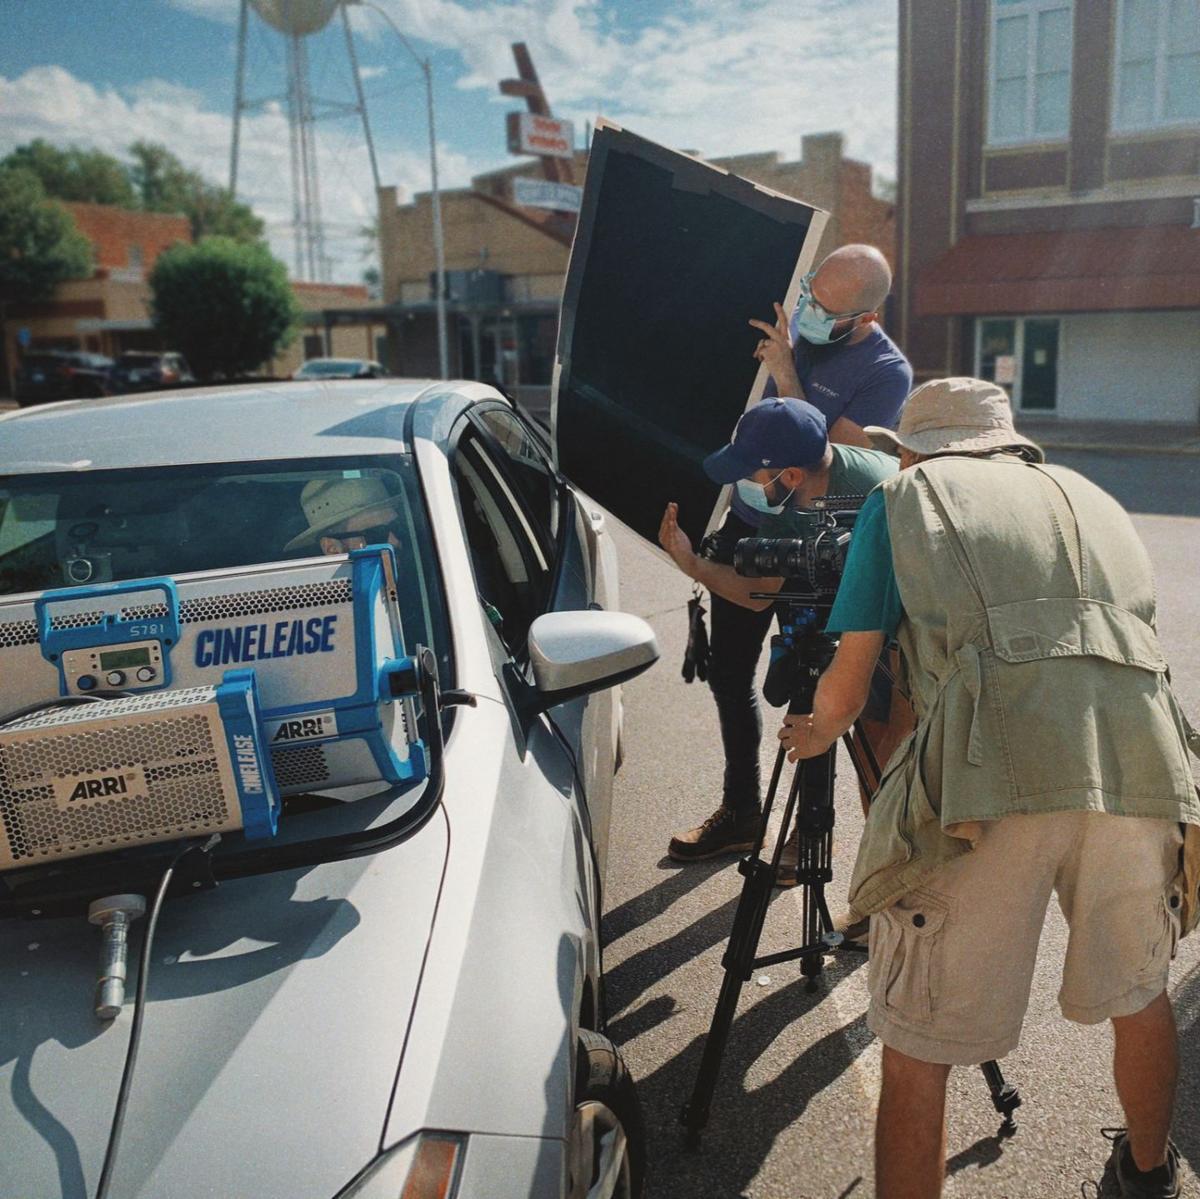 Film Friendly community push advances